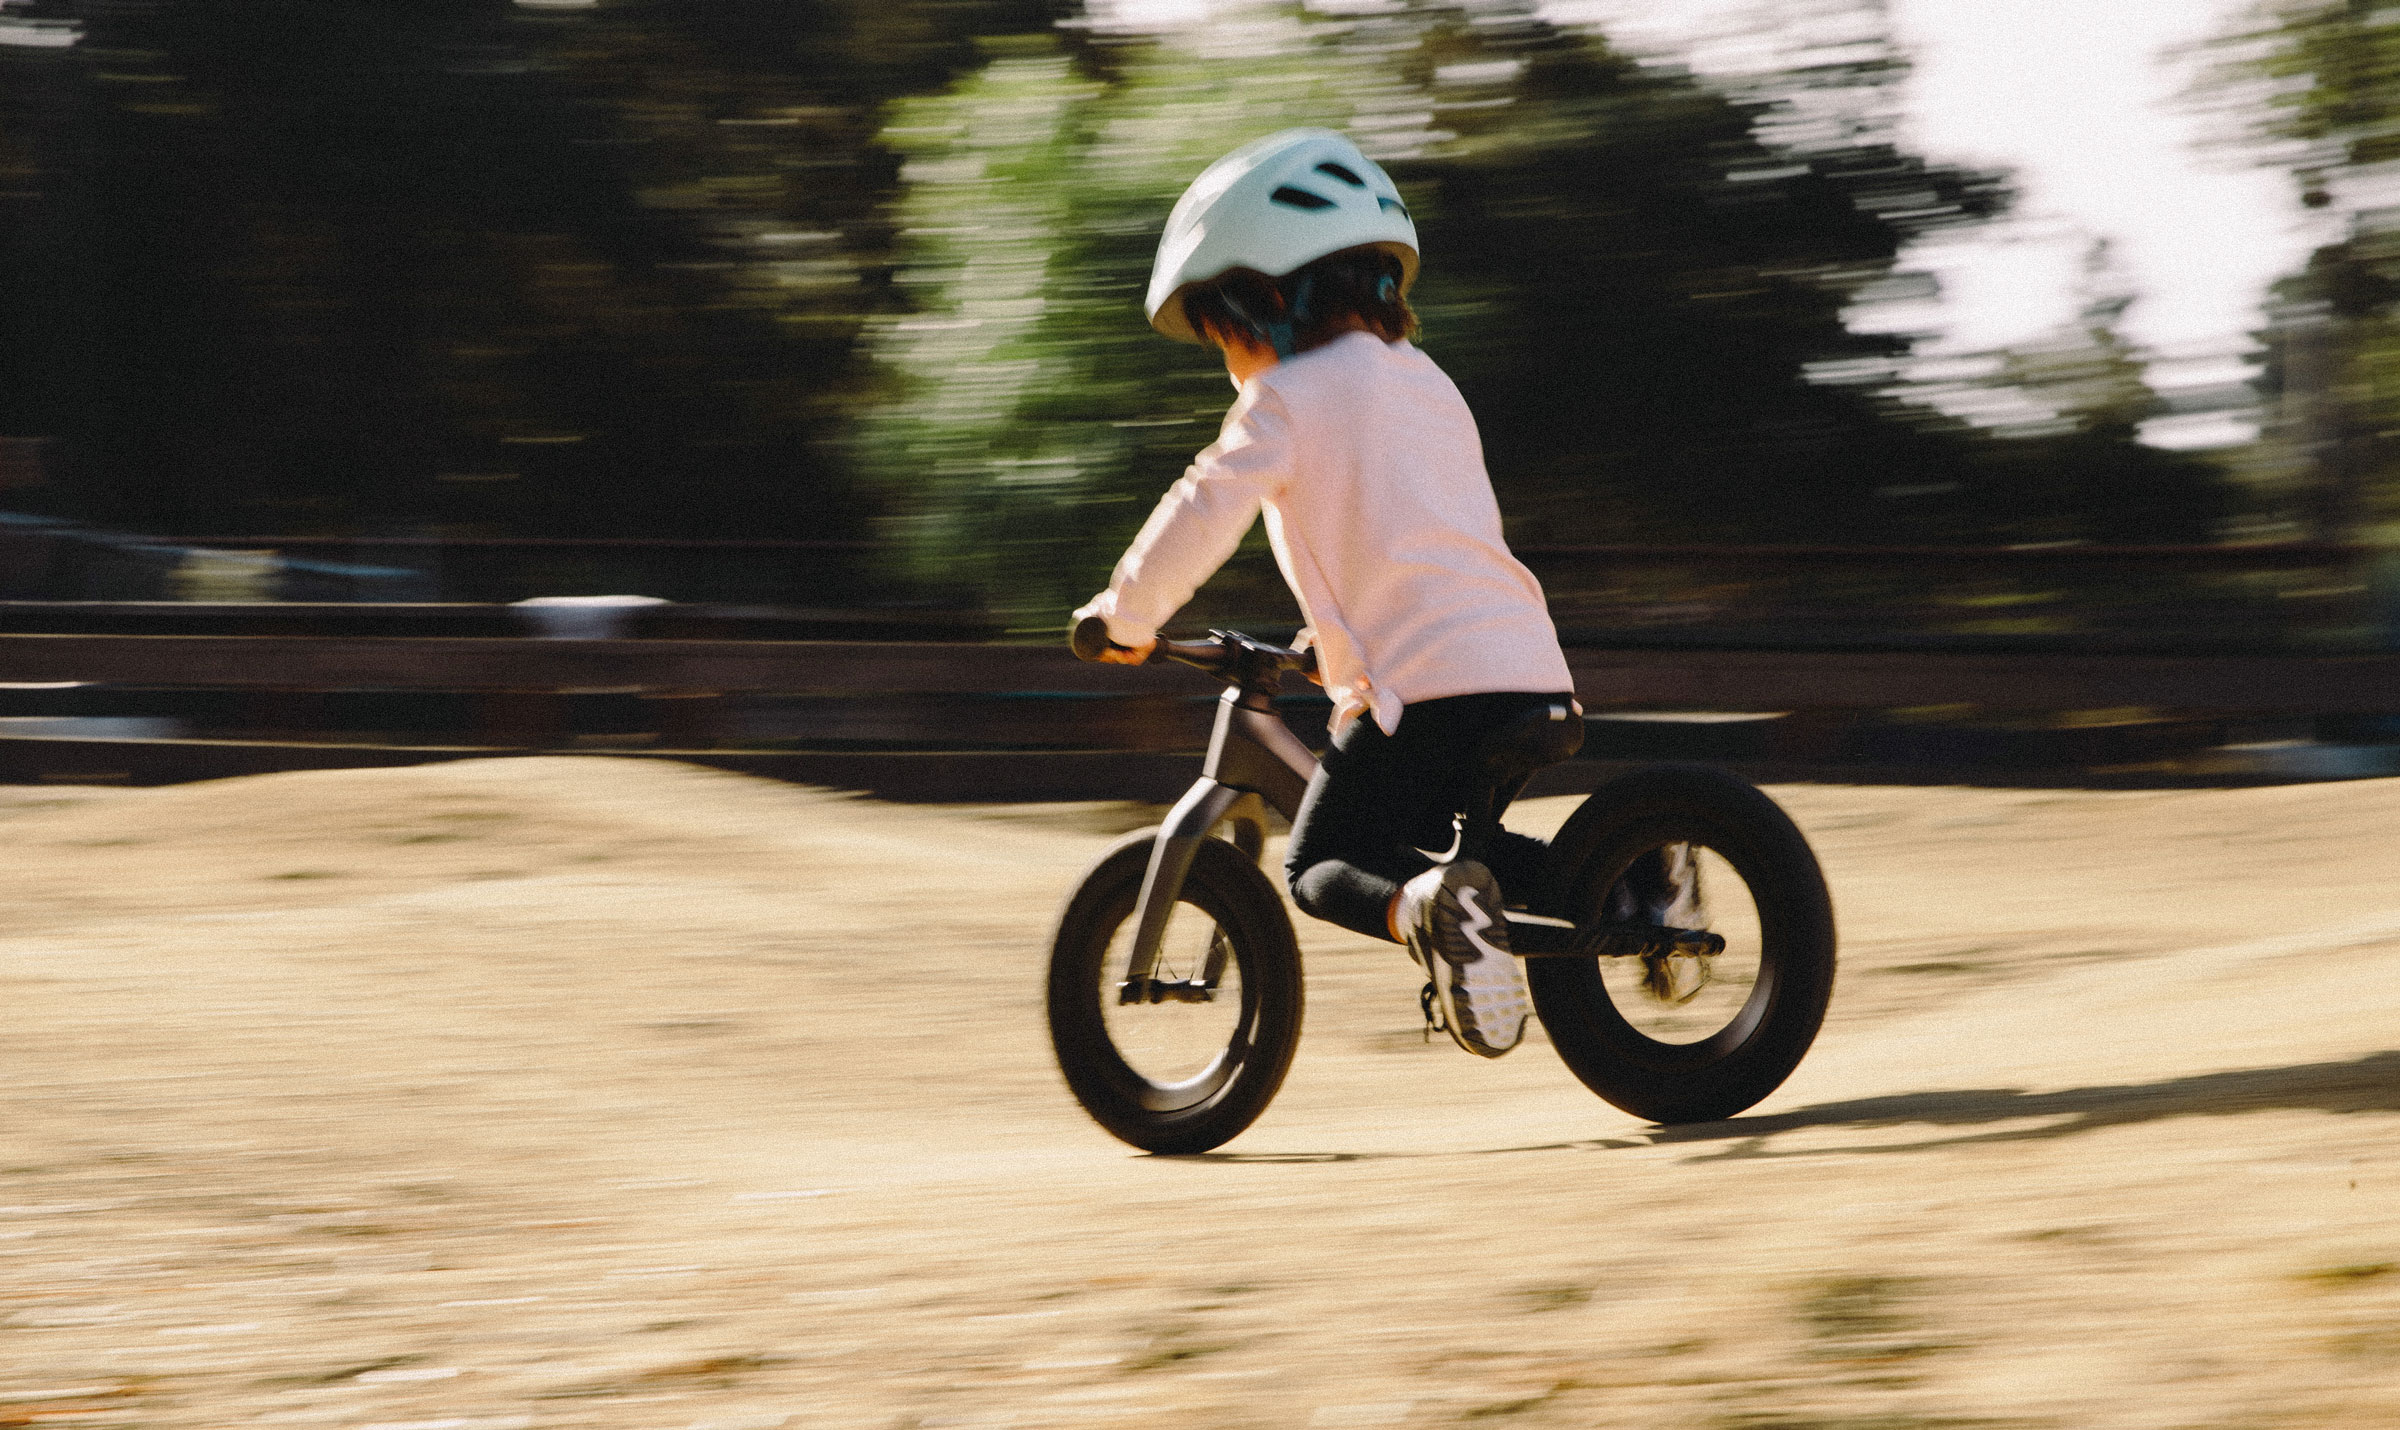 Hotwalk carbon riding